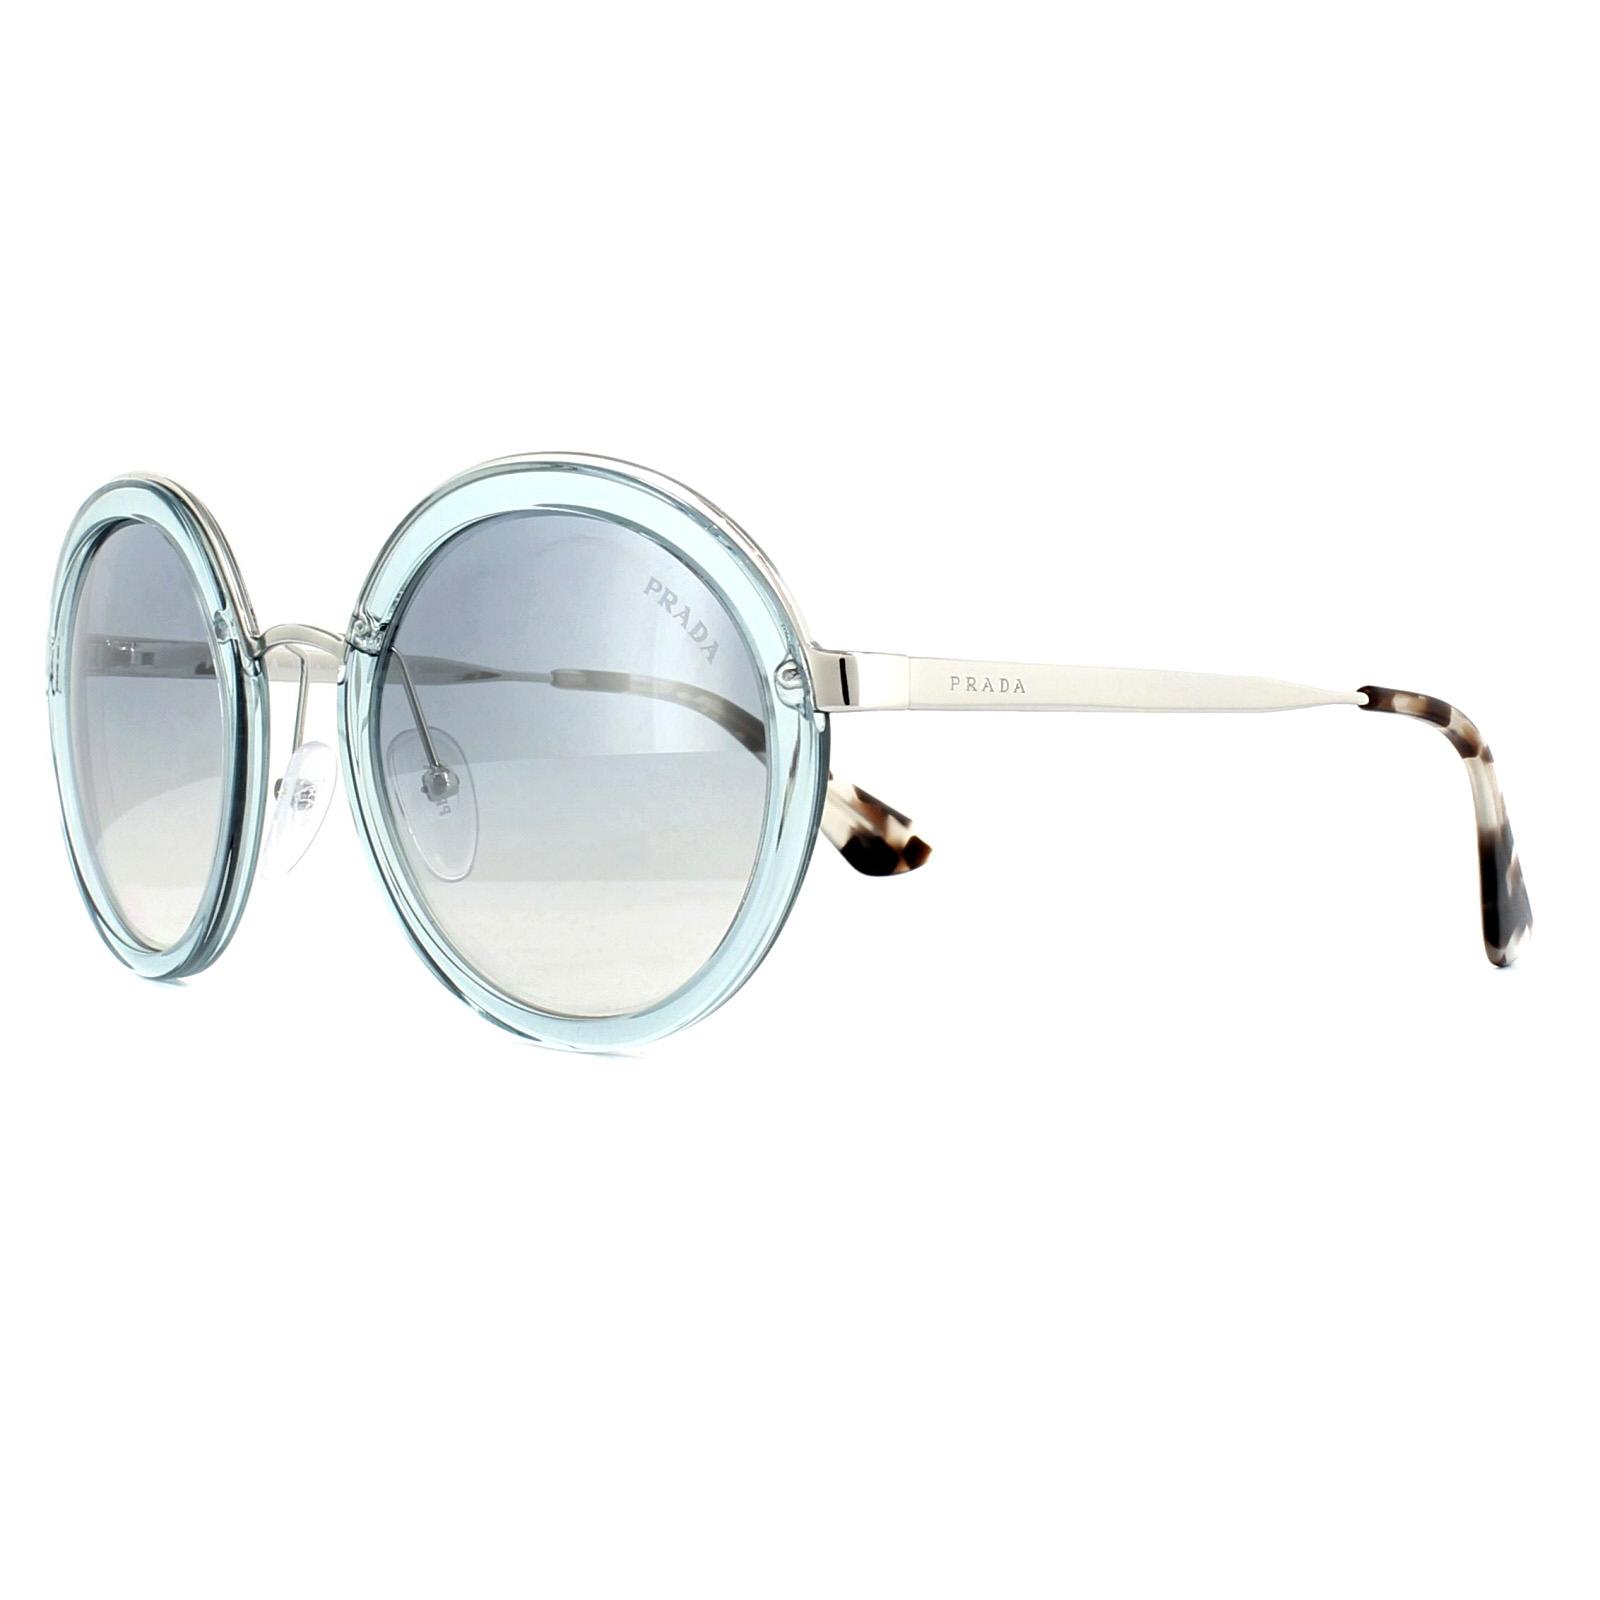 110d466f48b Sentinel Prada Sunglasses 50TS VYS5R0 Transparent Azure Blue Mirror